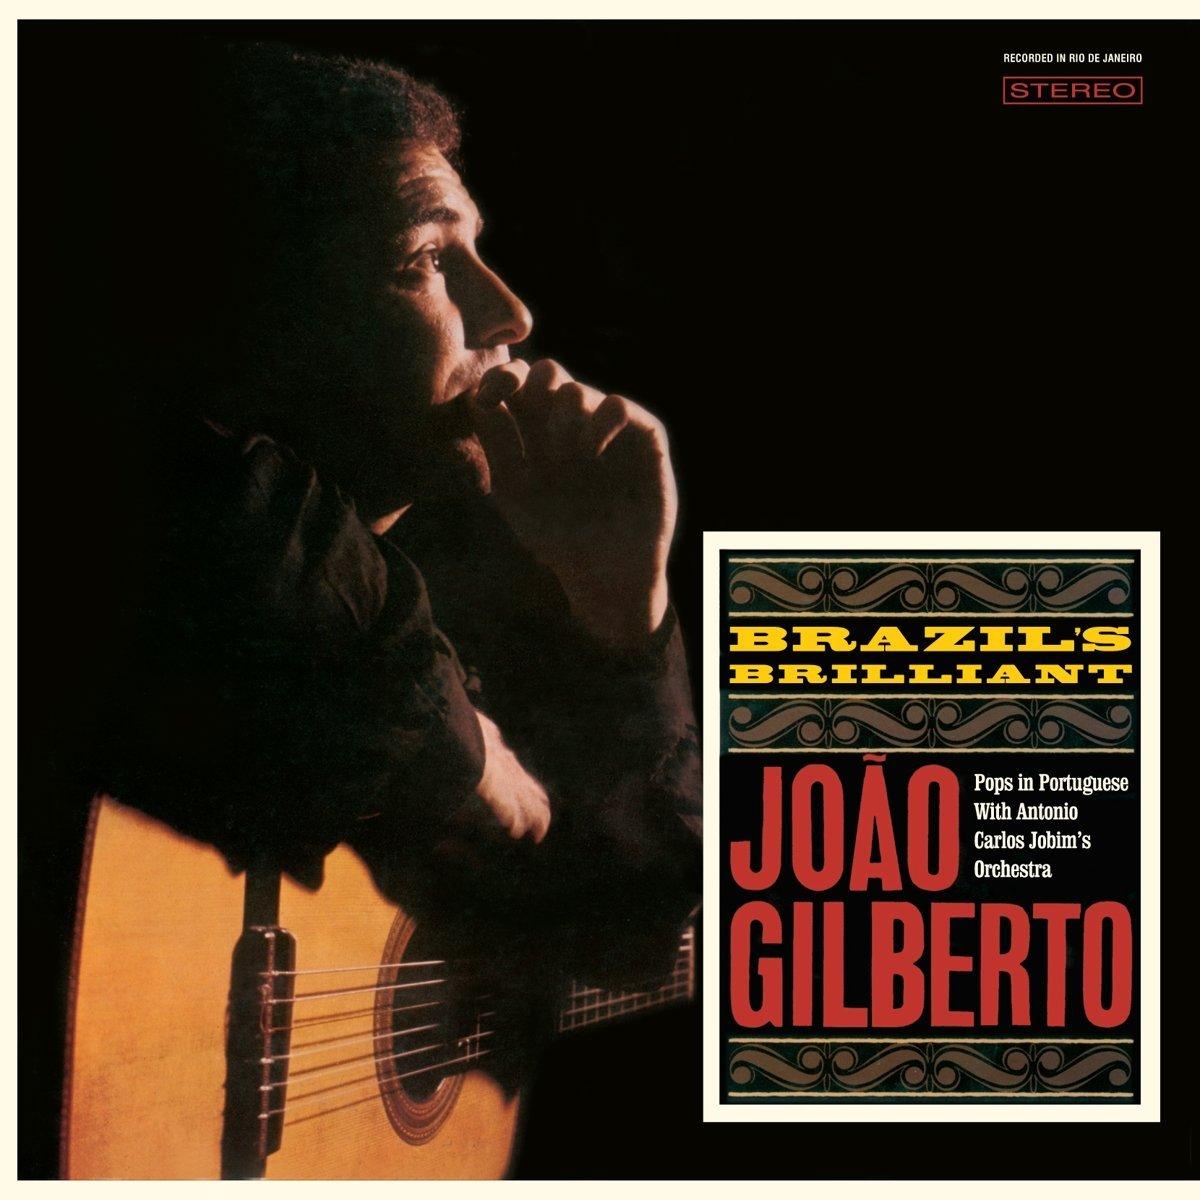 Copertina Disco Vinile 33 giri Brazil's Brilliant di Joao Gilberto